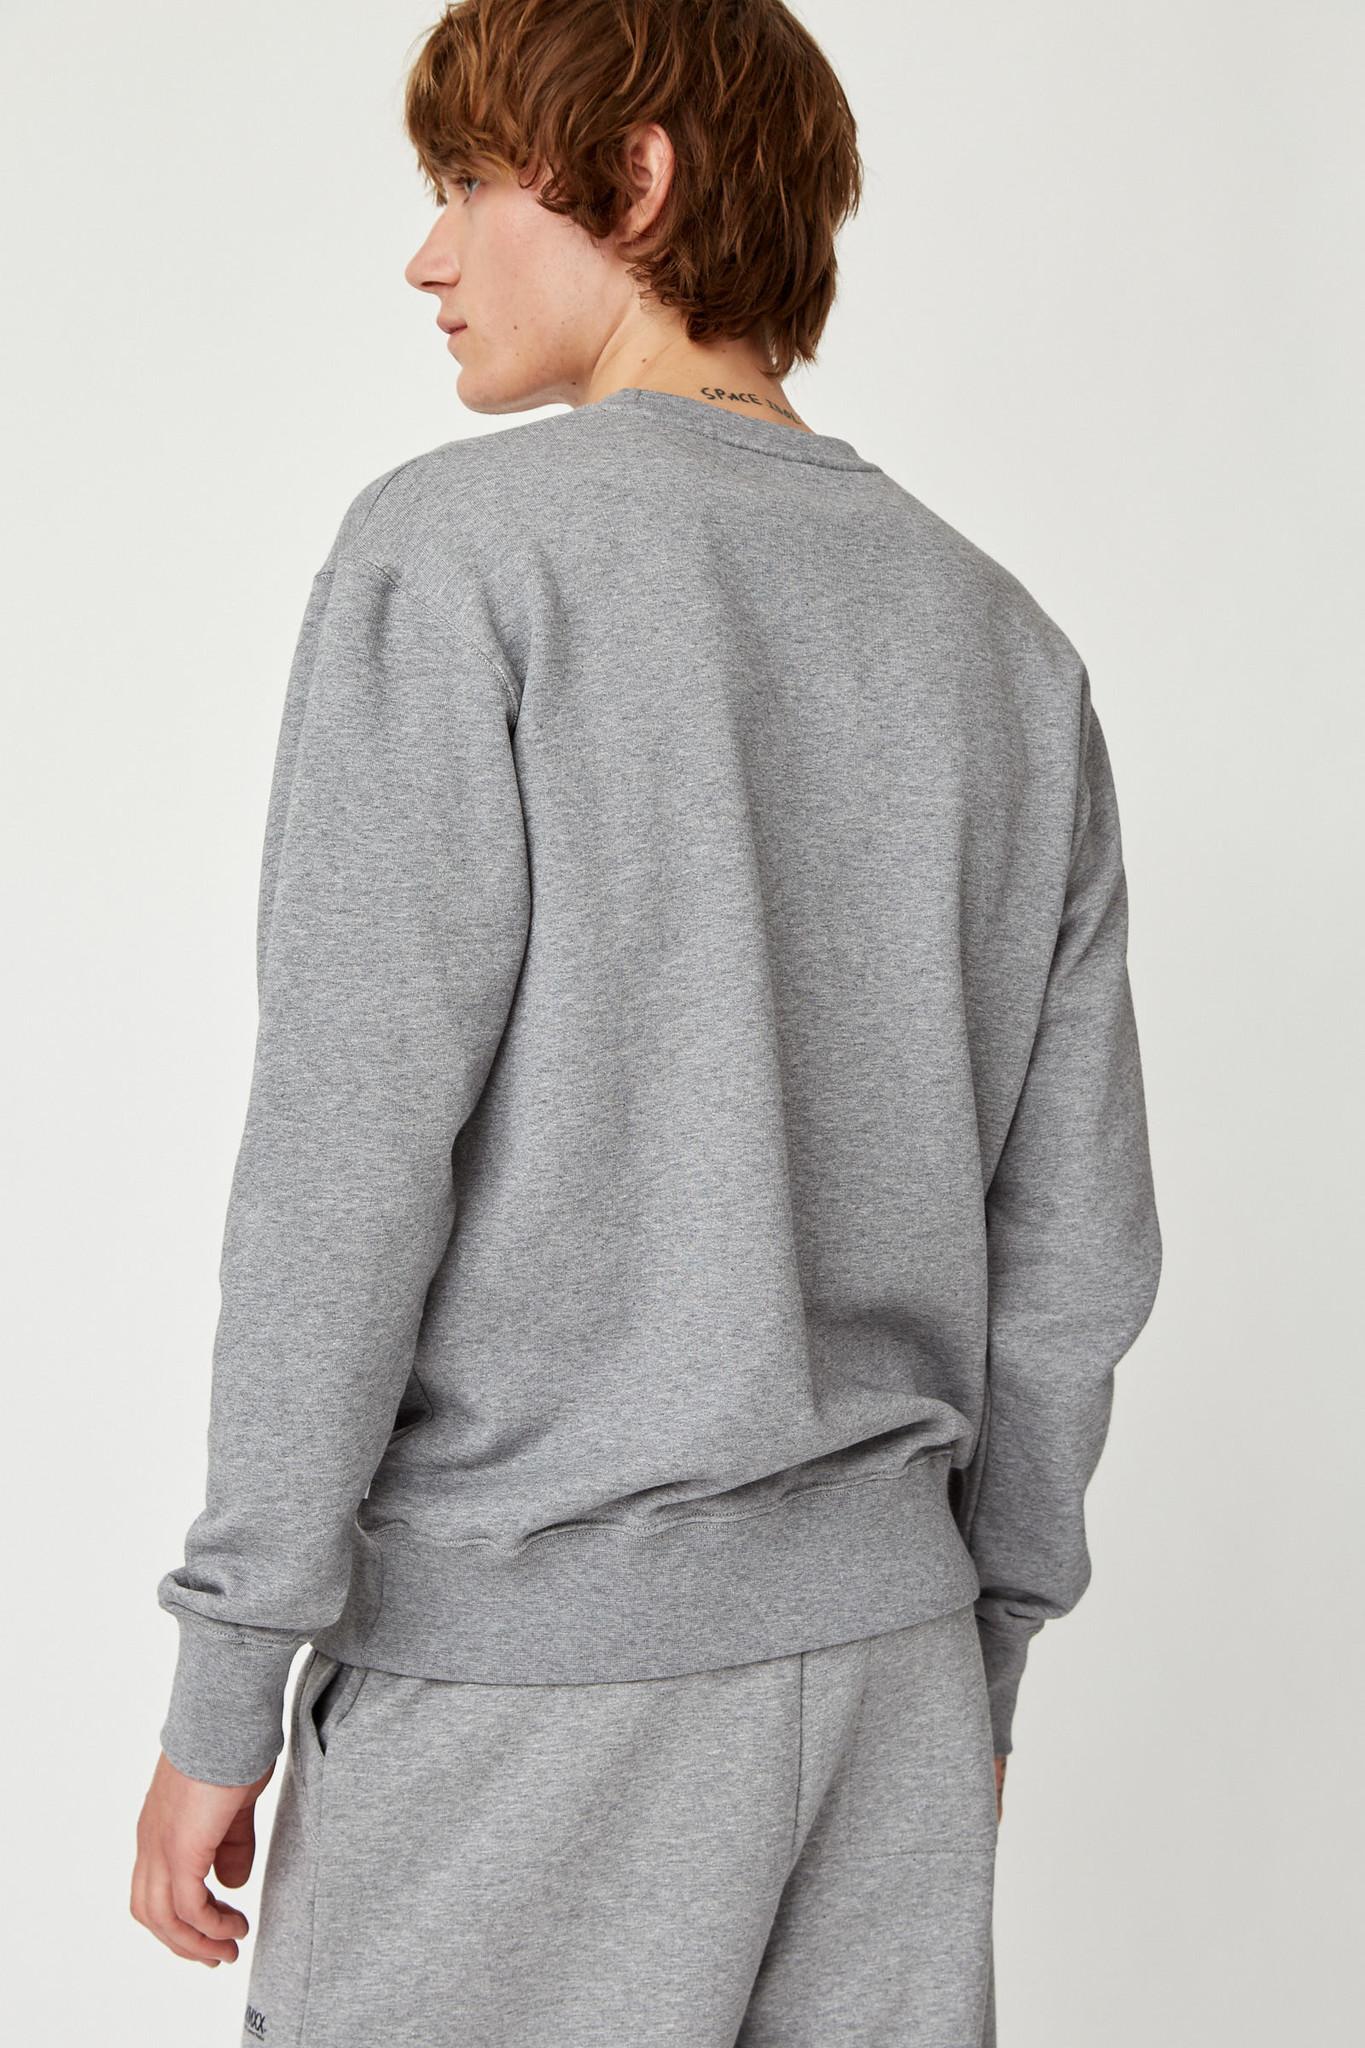 Hugh Sweatshirt Grey Melange Unisex-7